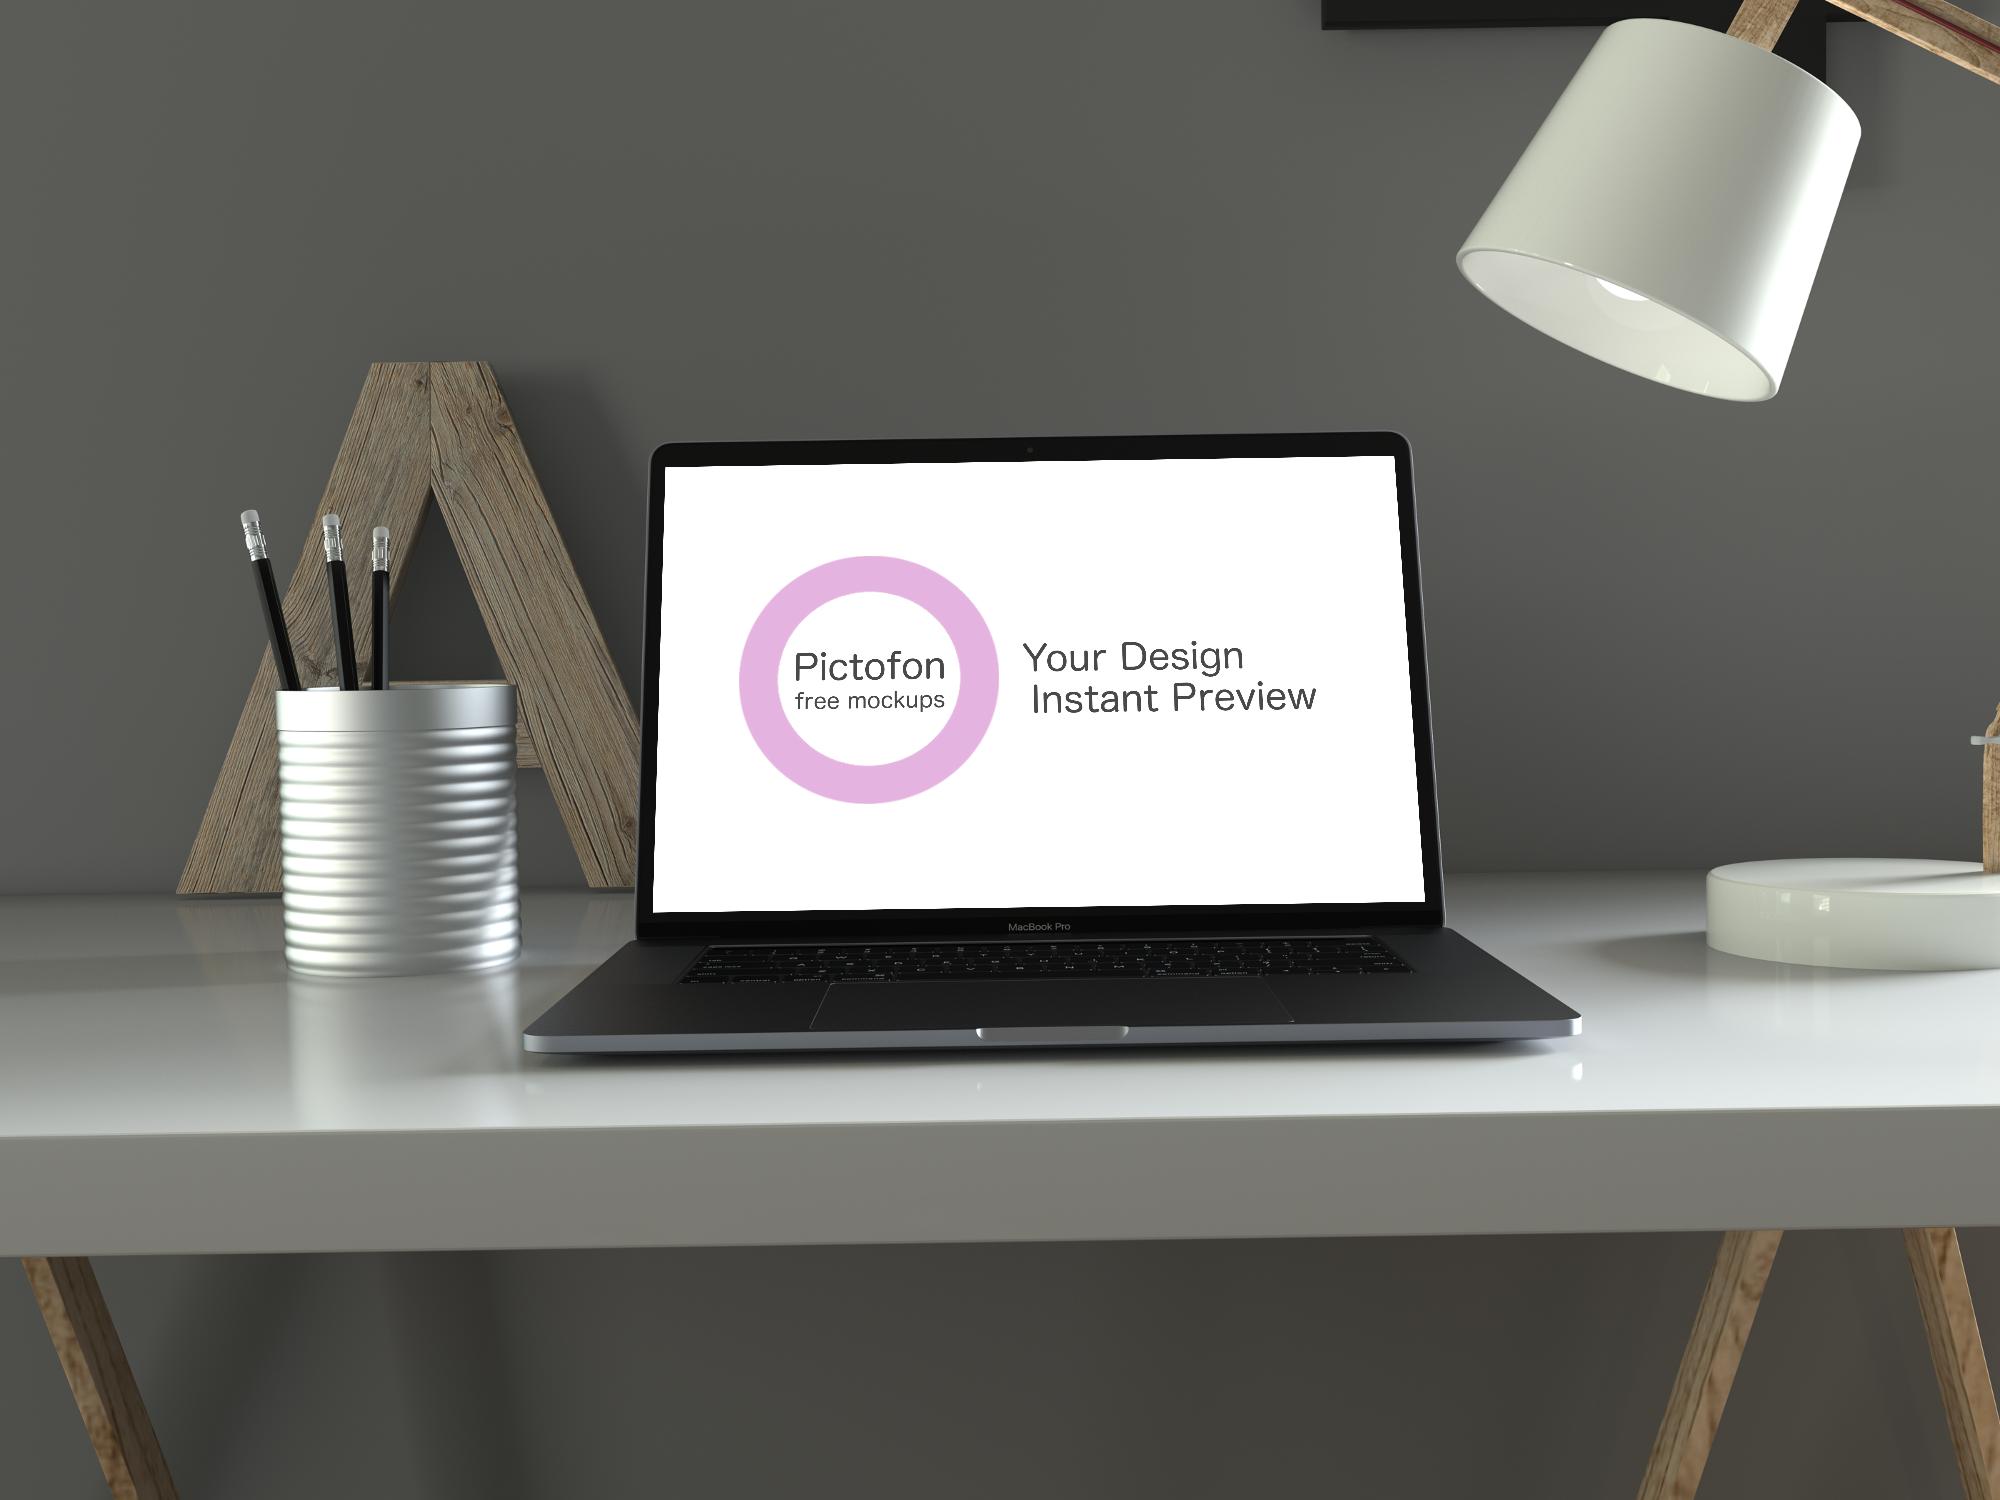 New macbook mockup free mockups pinterest mock up and business business cards new macbook mockup reheart Image collections